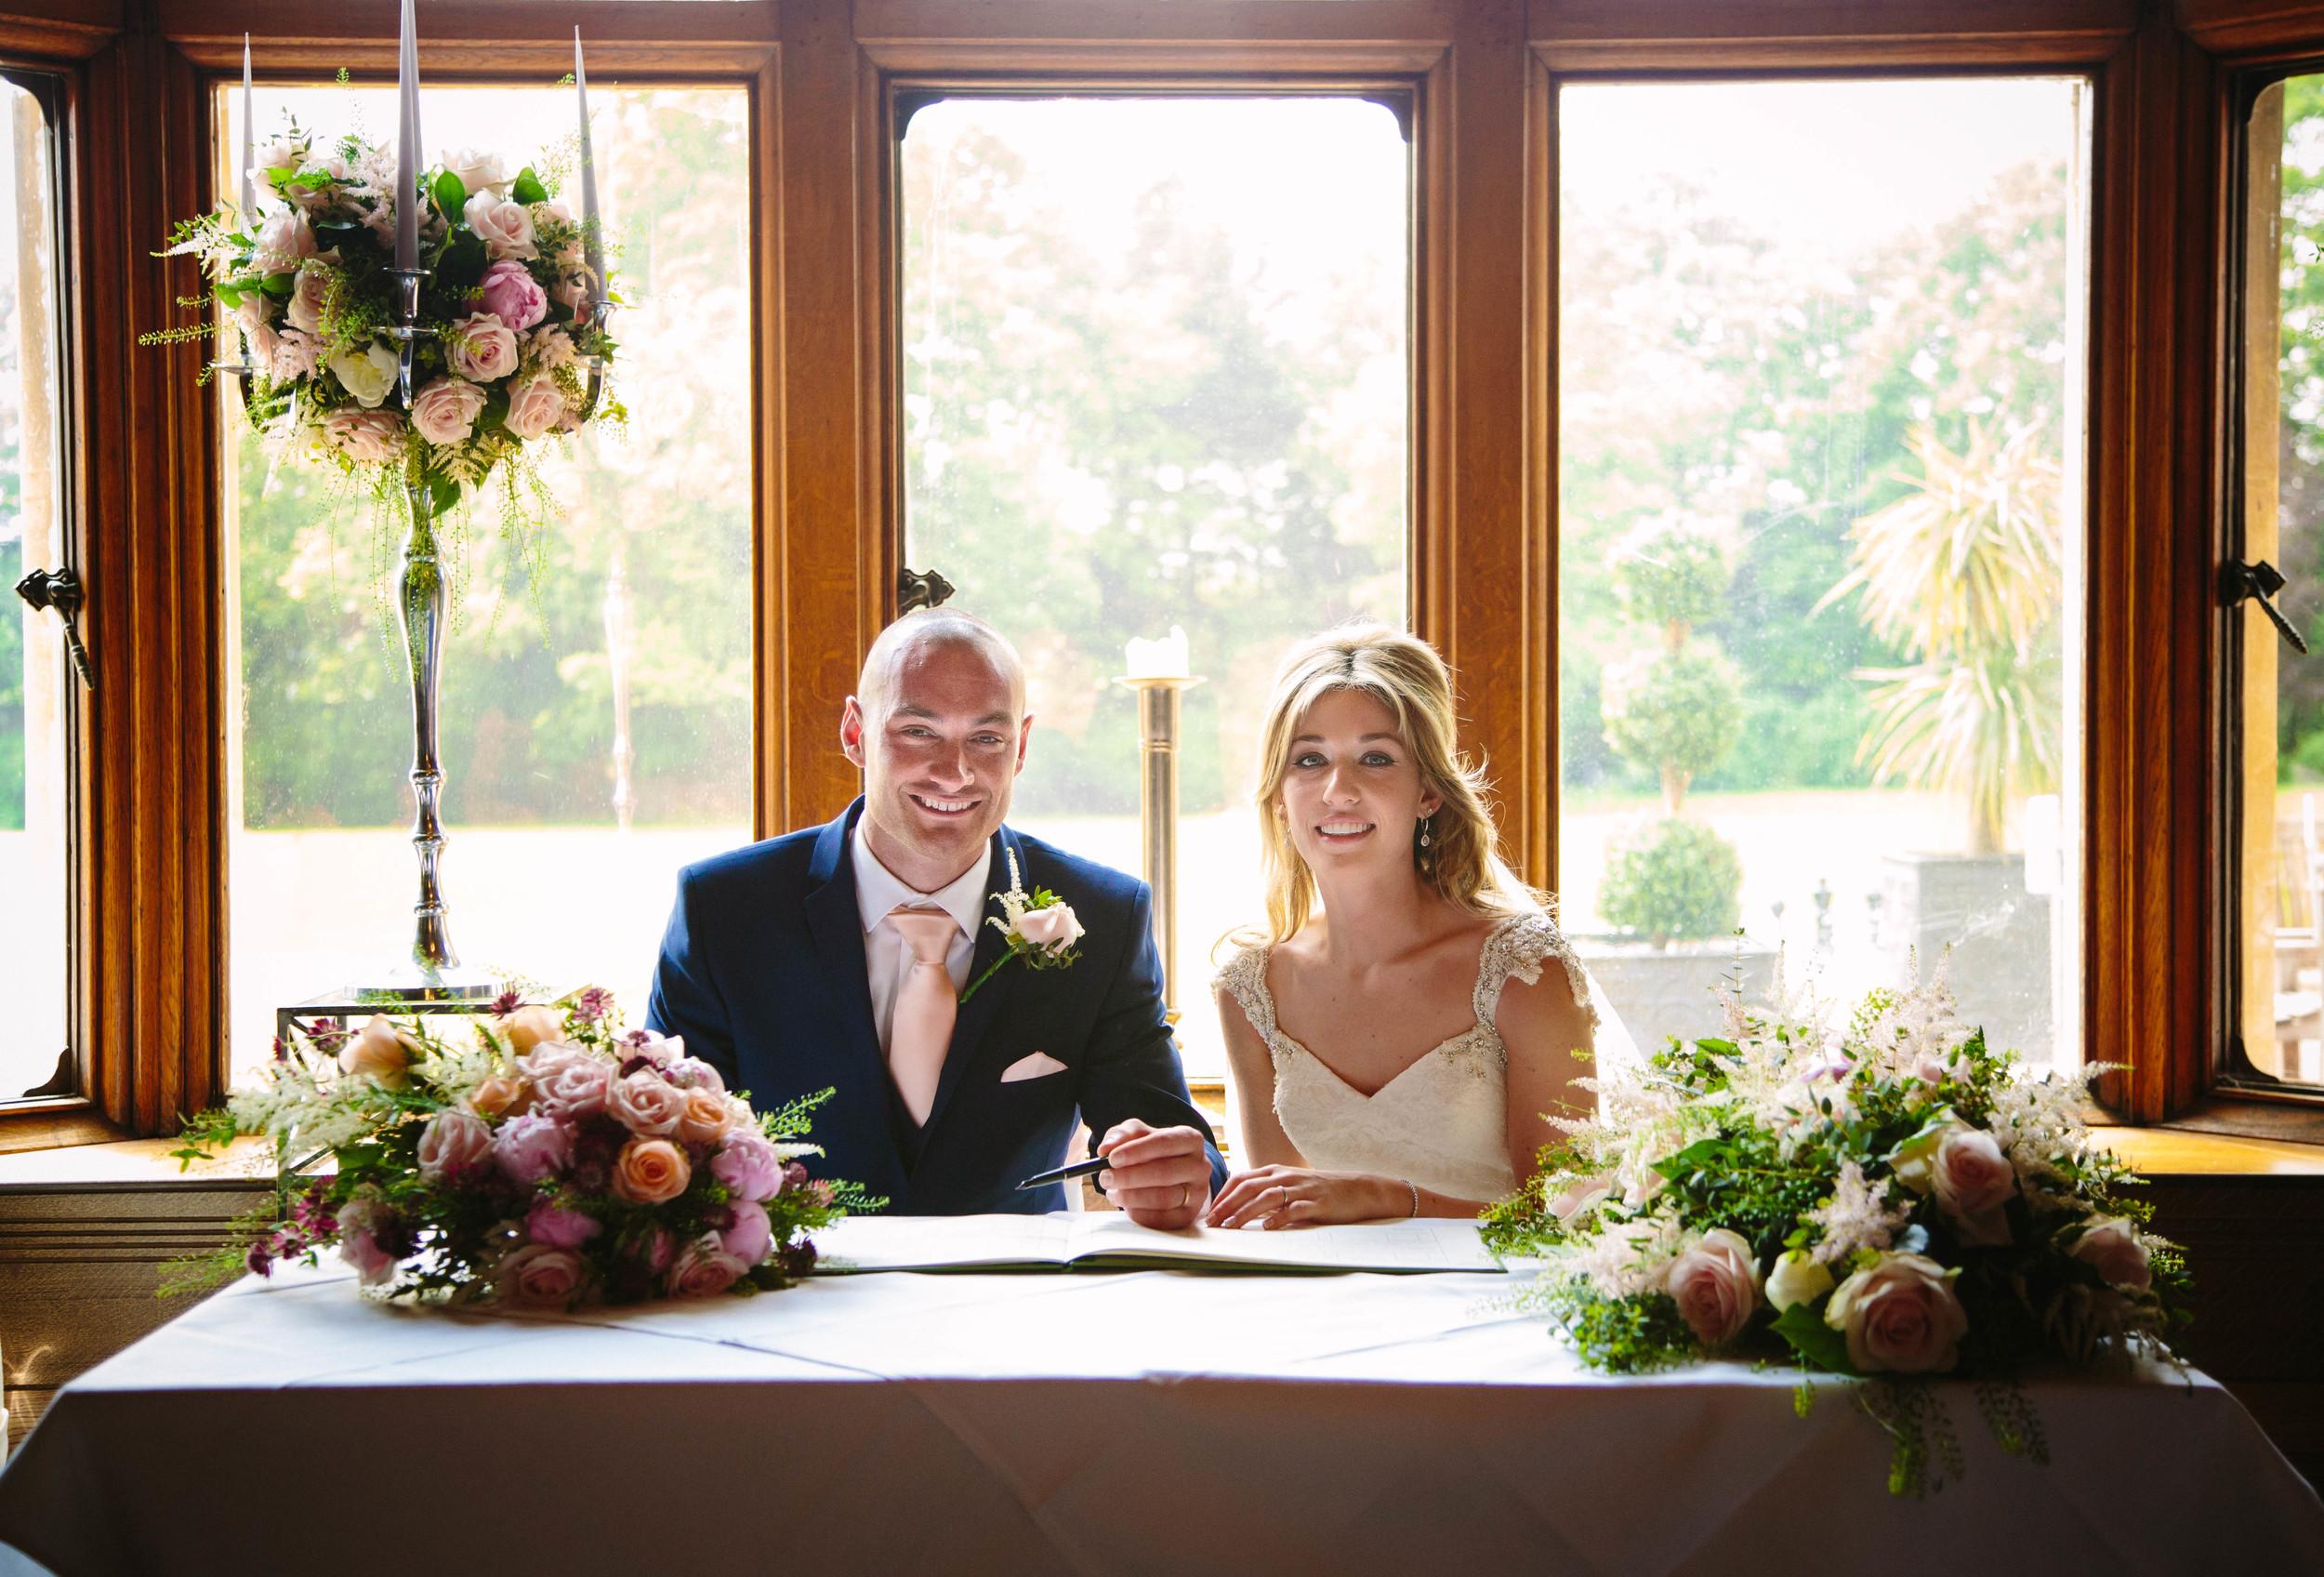 Woodlands-Park-Hotel-Cobham-Surrey-wedding-18